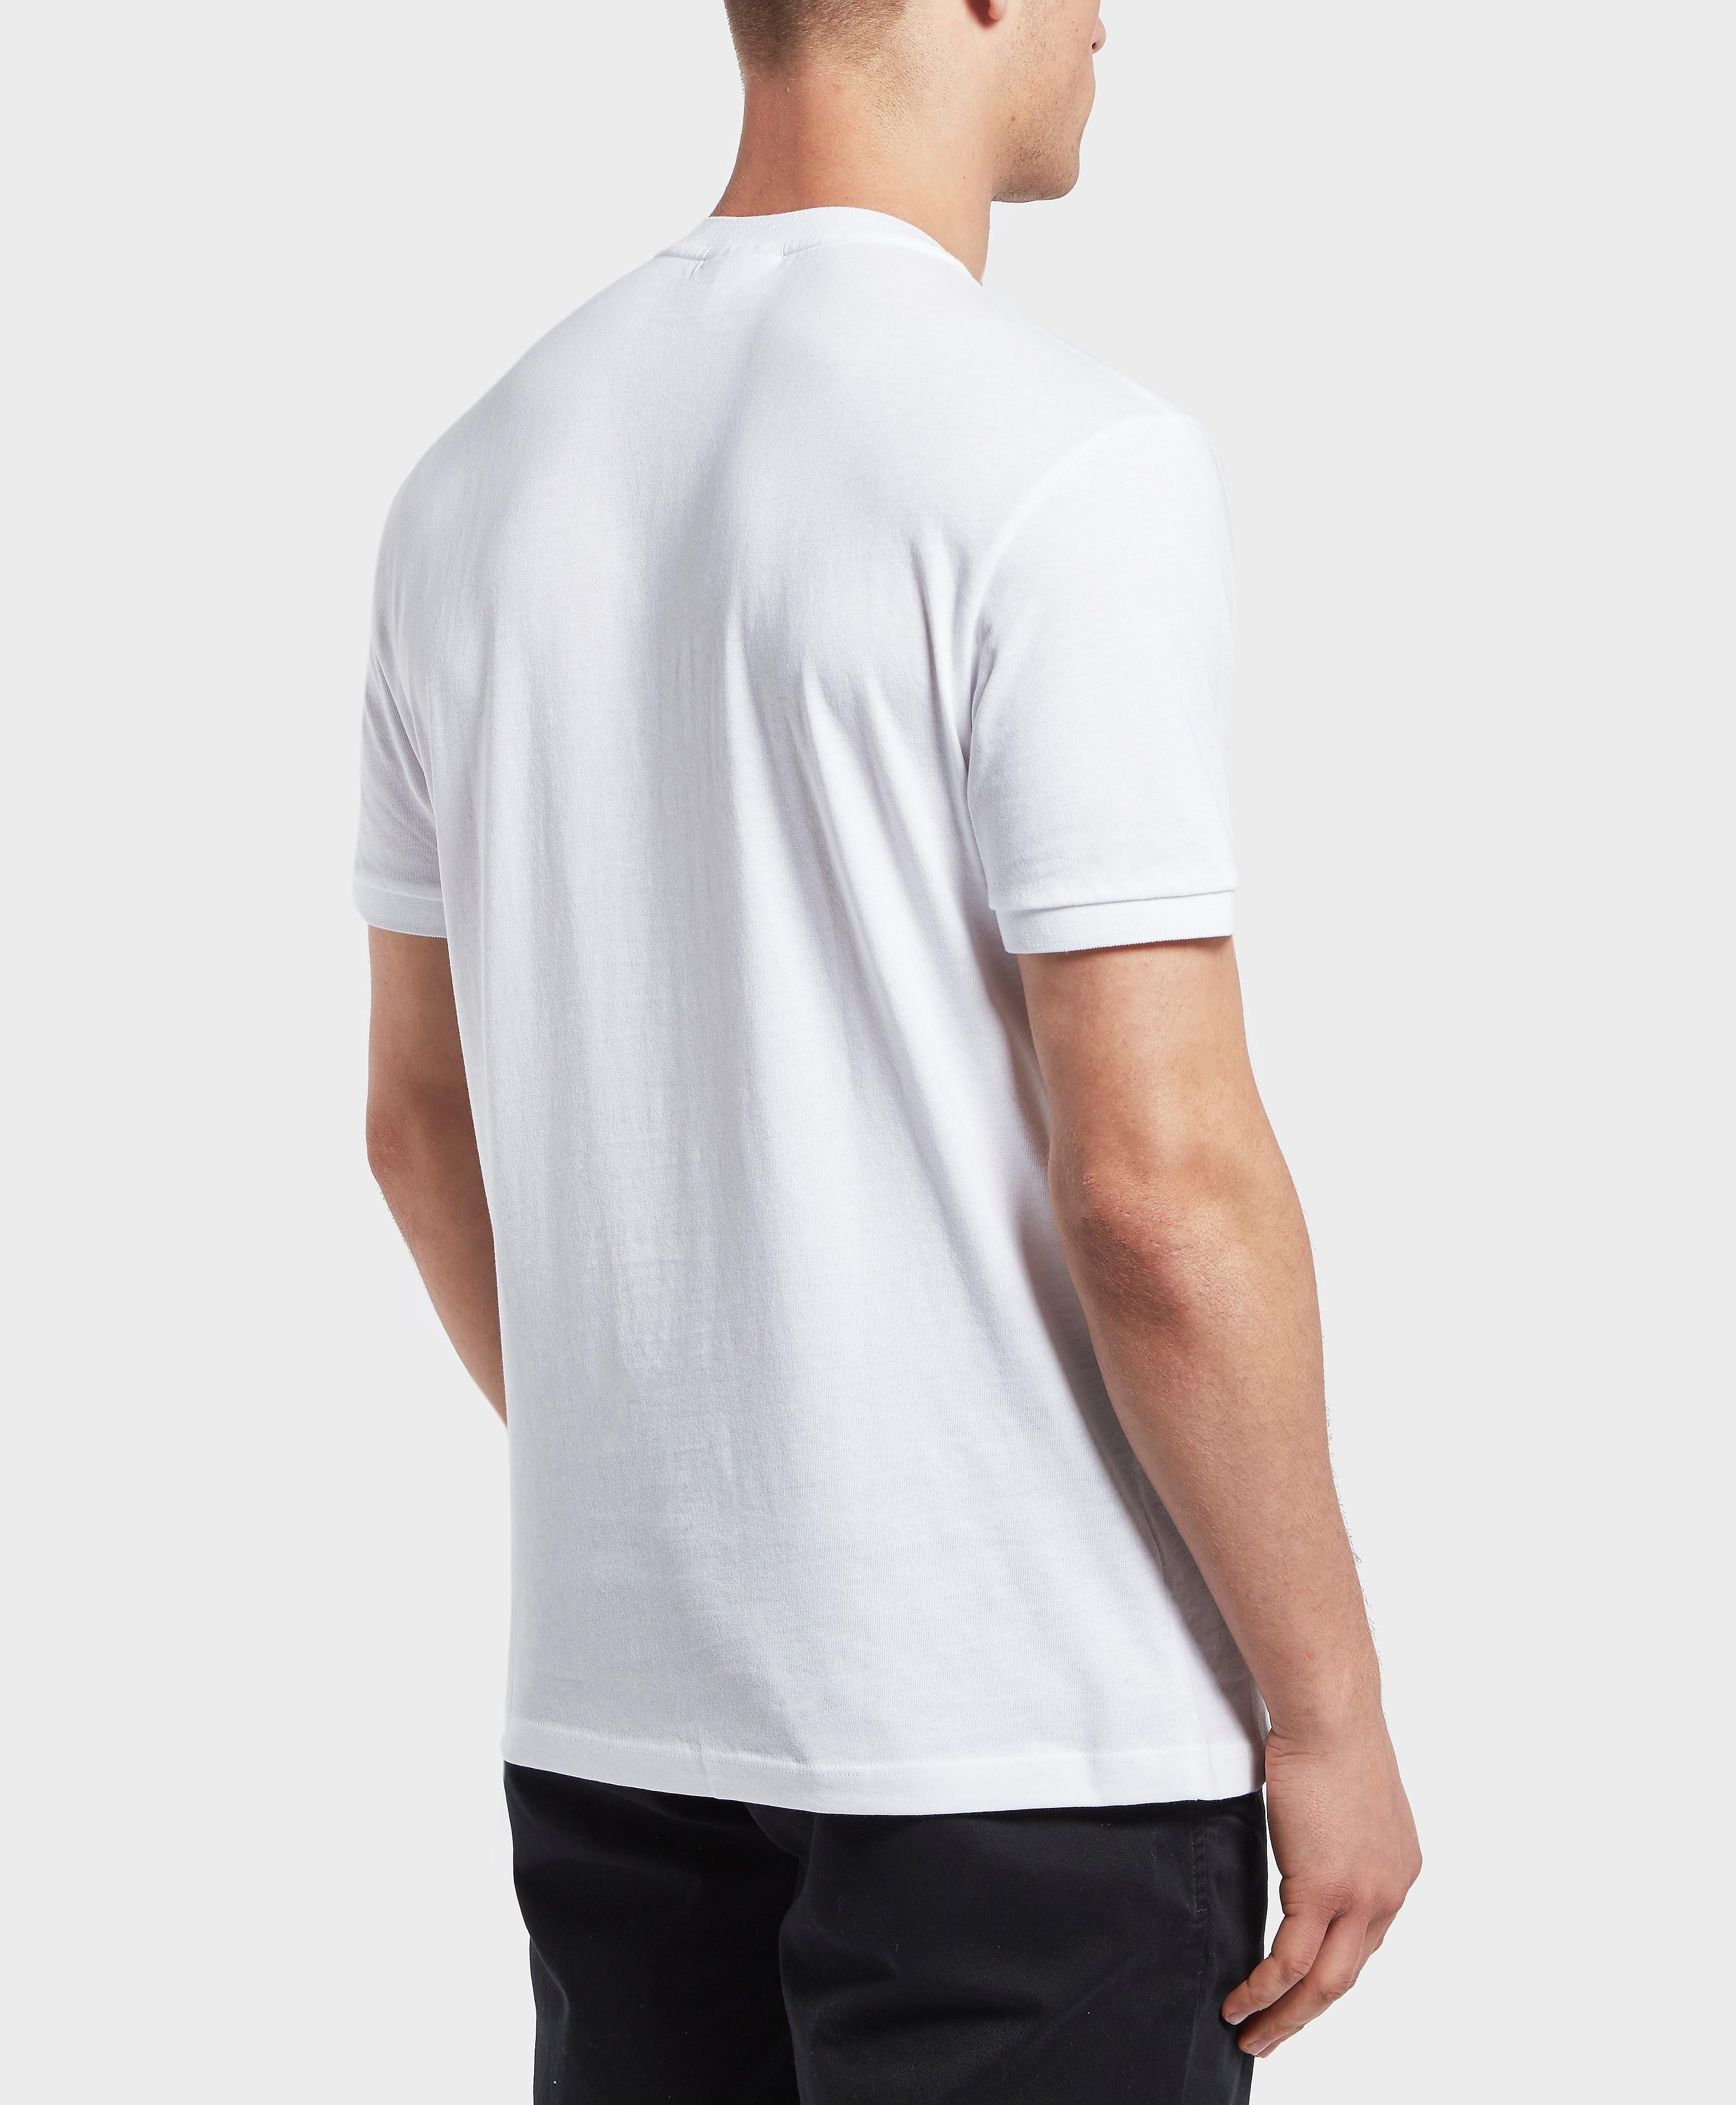 Lacoste Big Croc Logo Short Sleeve T-Shirt